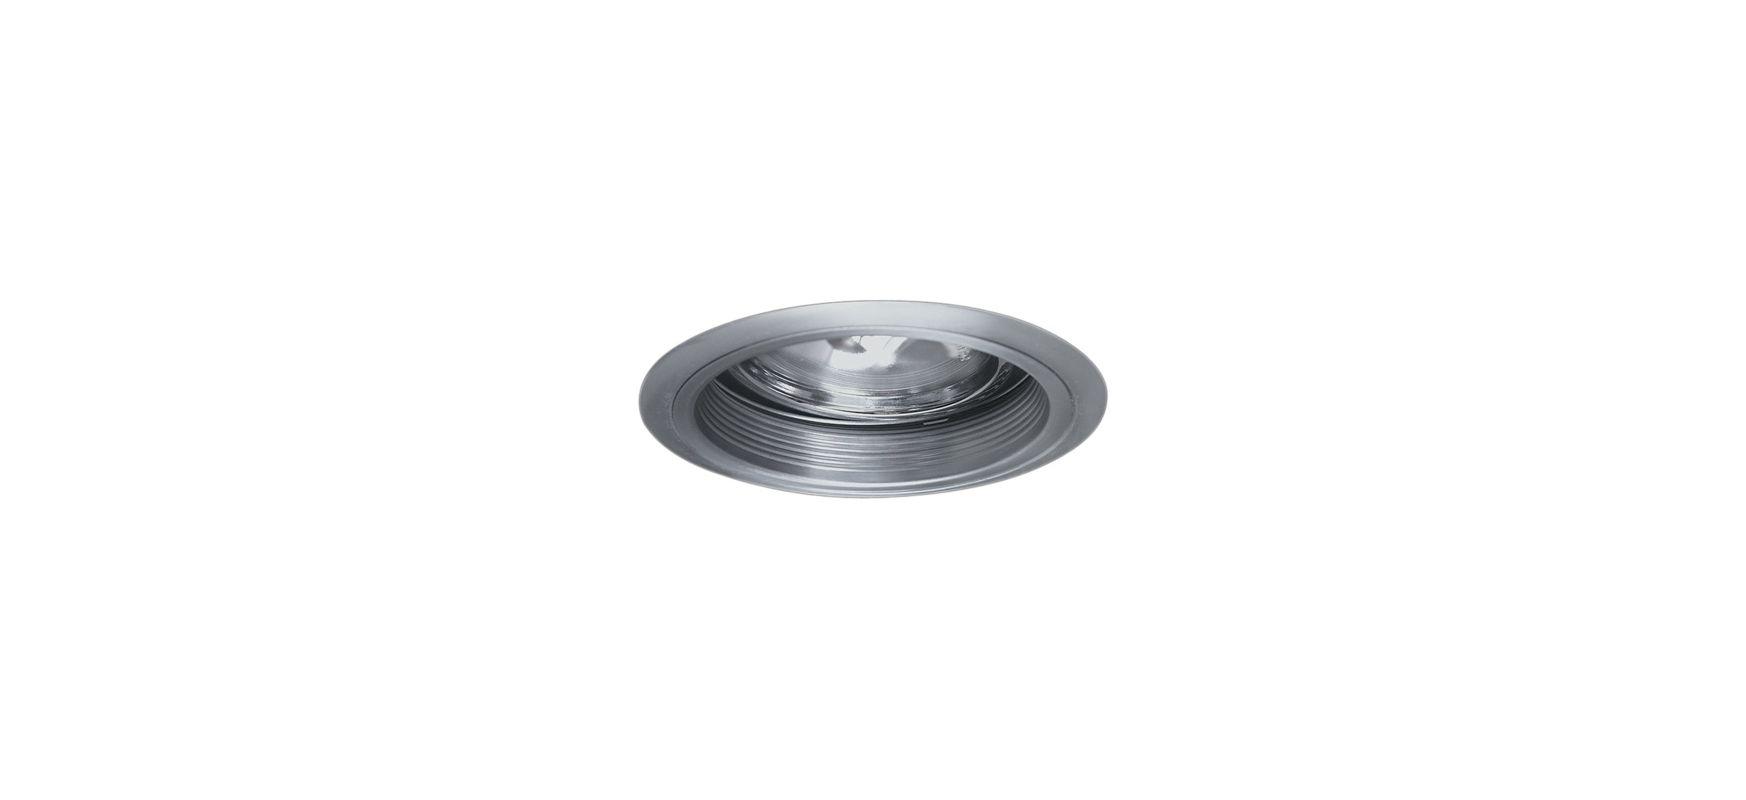 "Elco EL1575 6"" 50W Low-Voltage Retrofit Trim with Adjustable Gimbal"